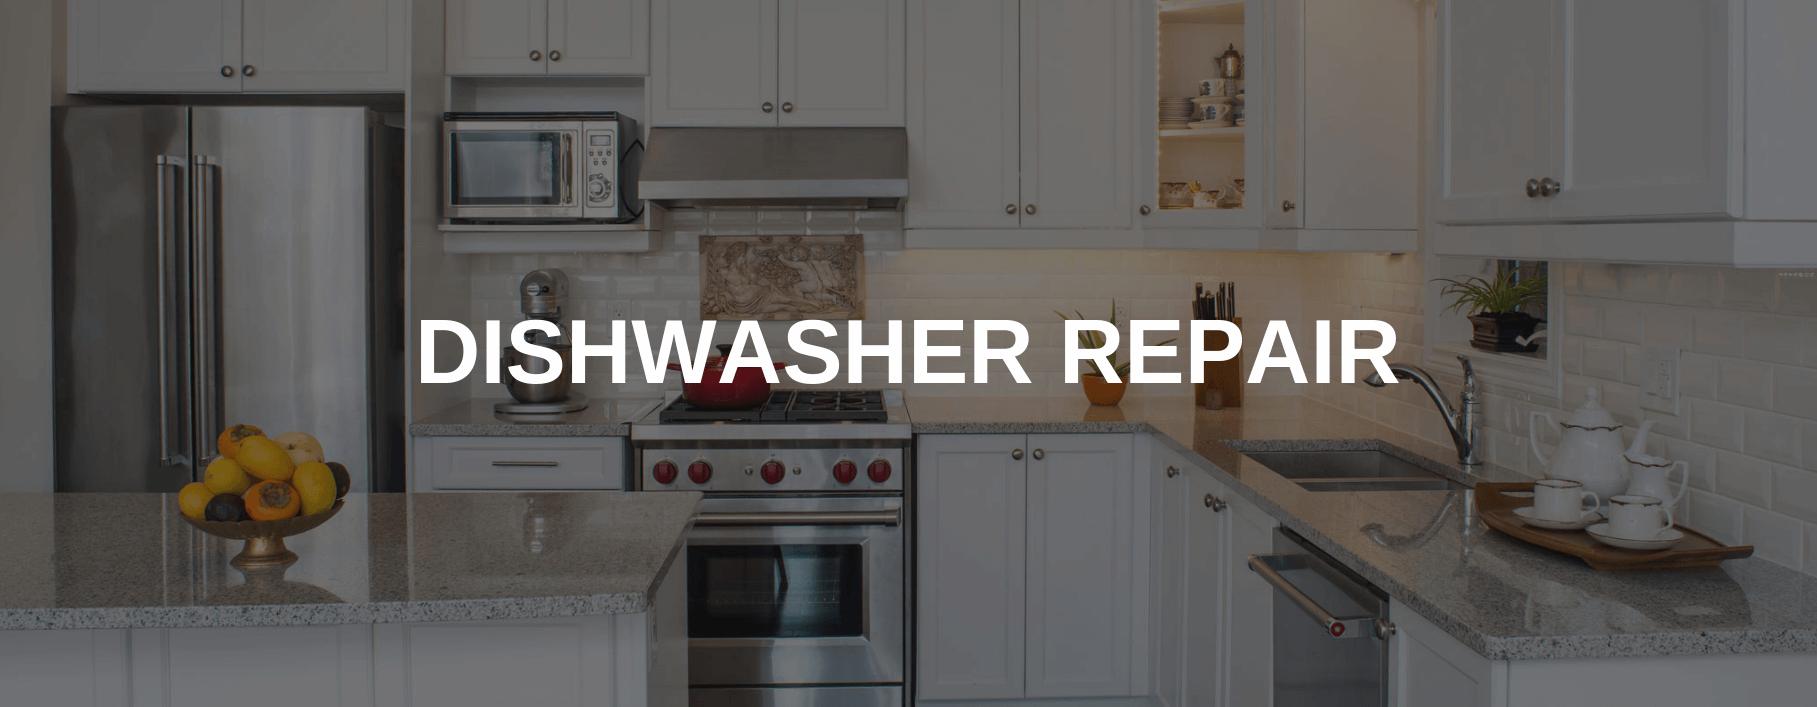 dishwasher repair norwich